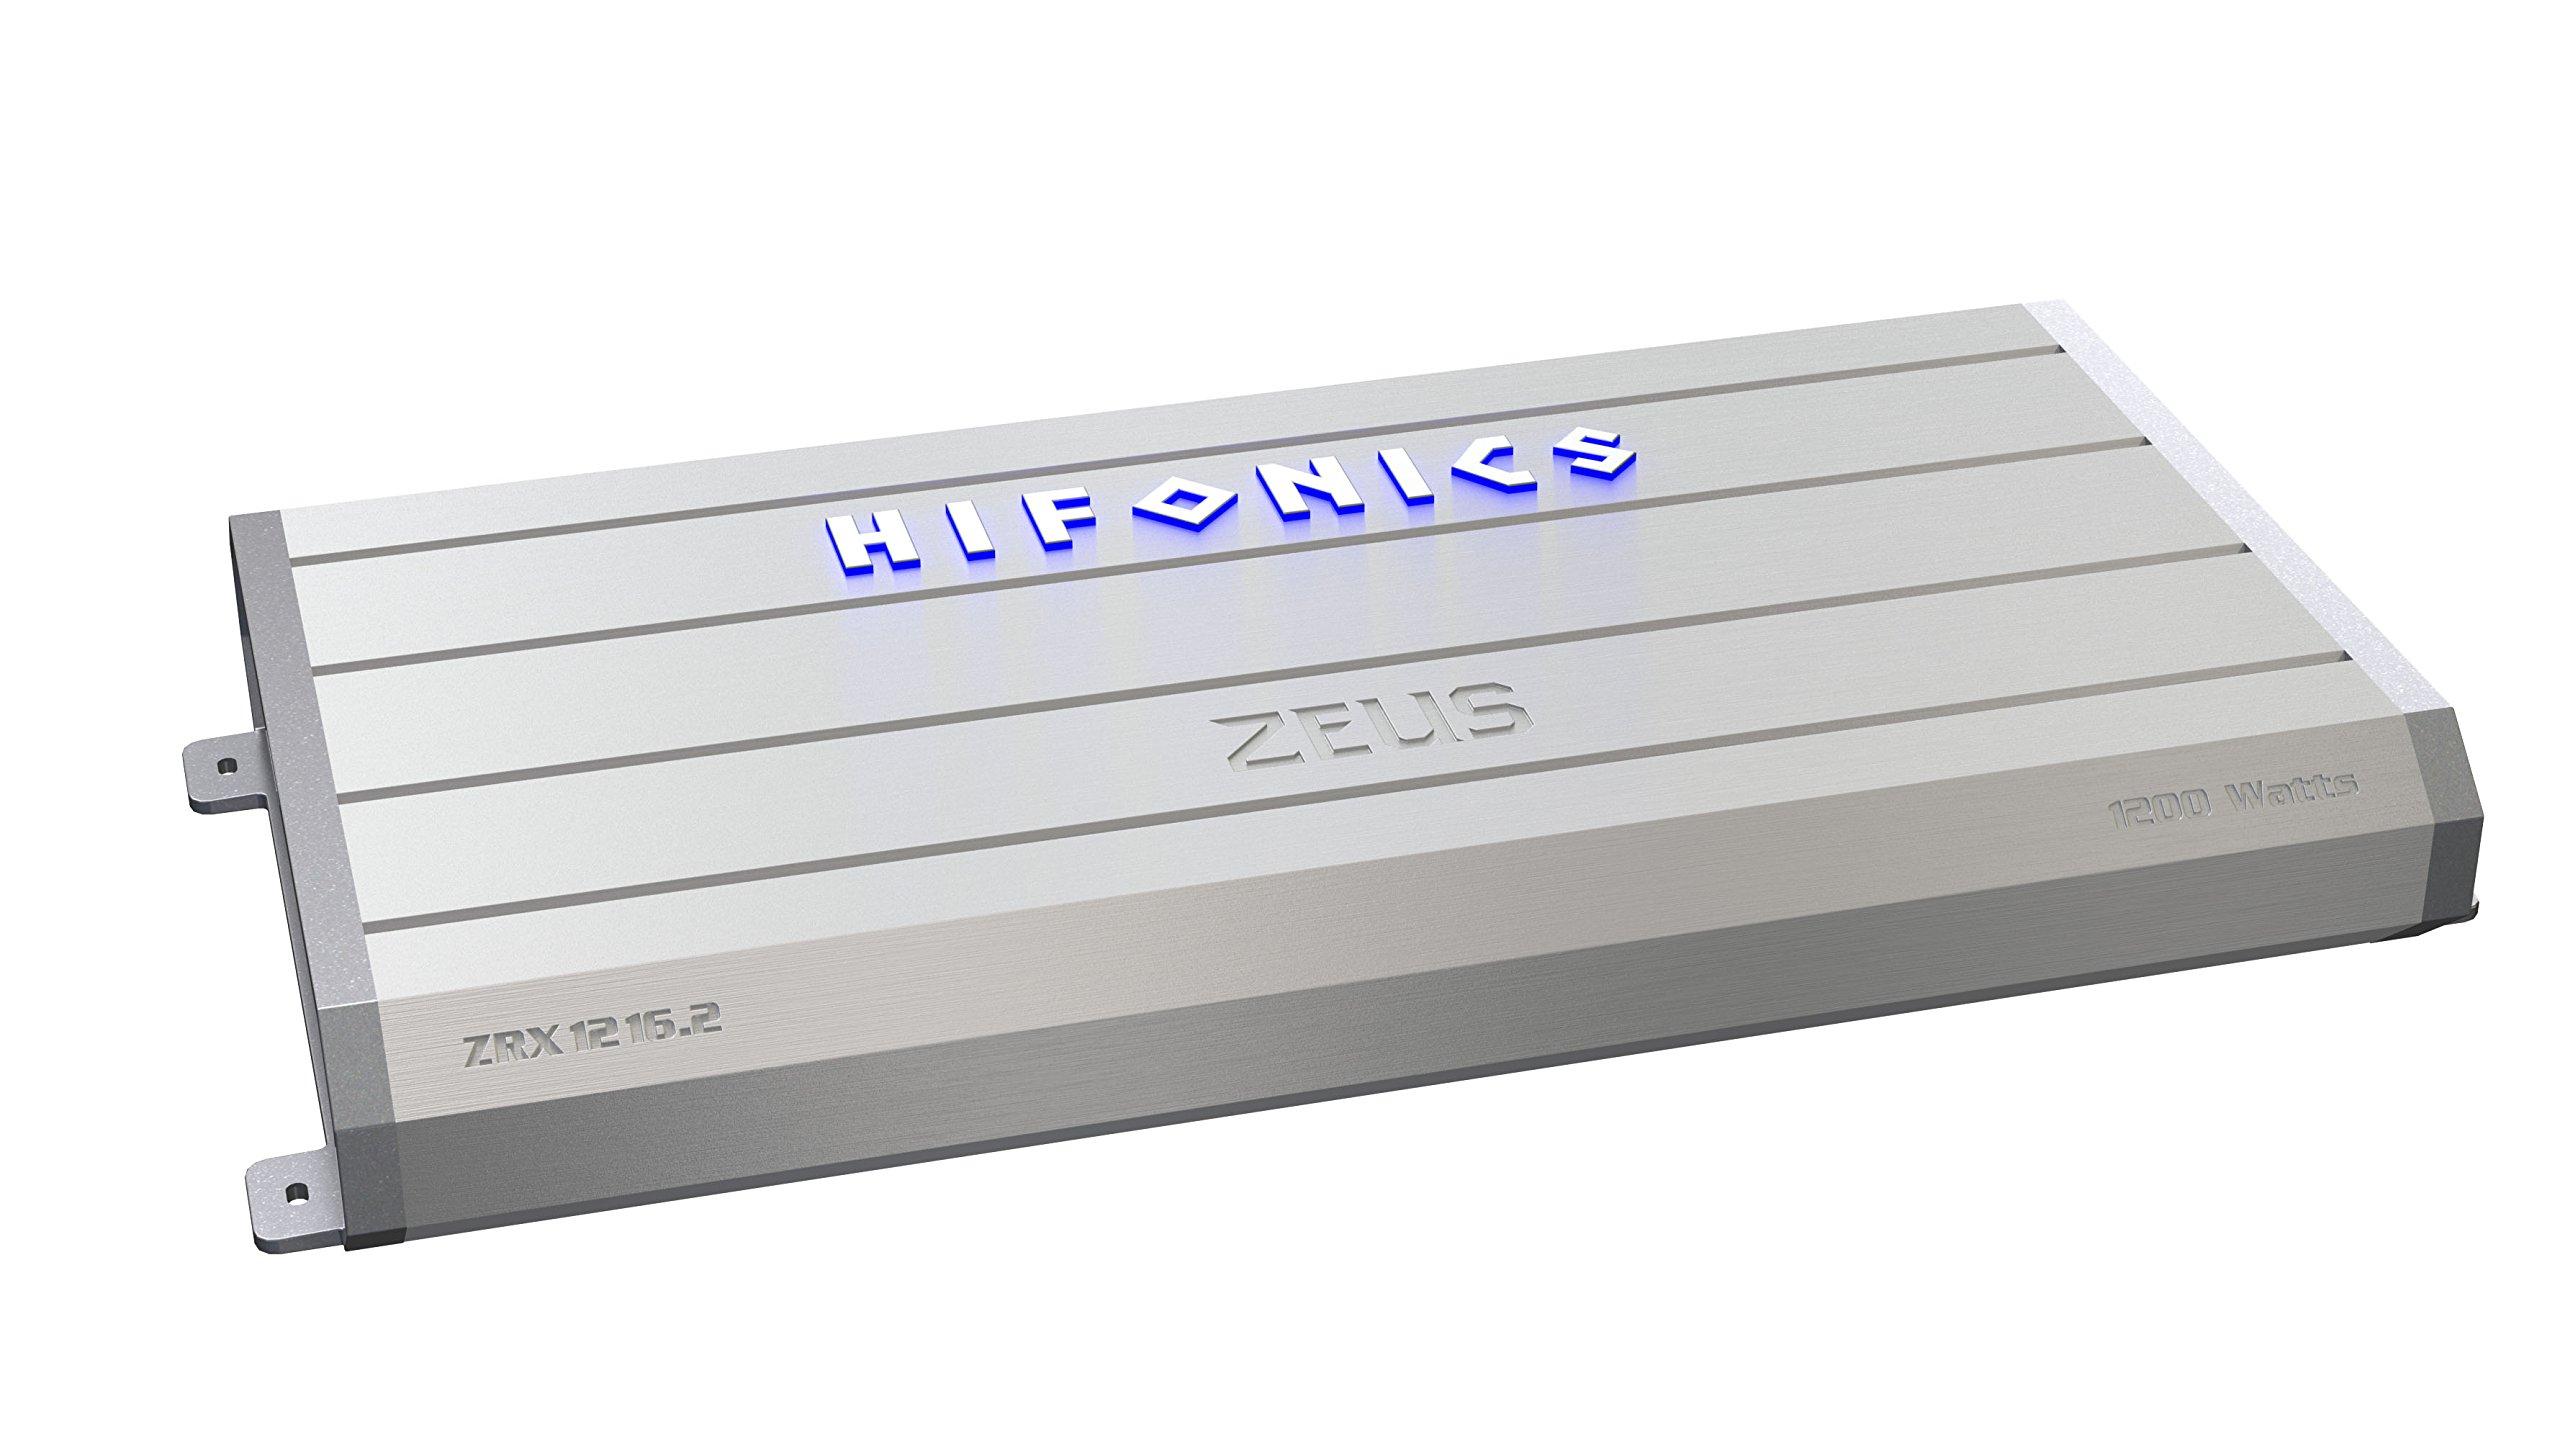 Best Rated In Car Audio Video Mono Amplifiers Helpful Customer Jl Hifonics Zrx10164 Zeus Amplifier 4 Channel 1000 Watt Product